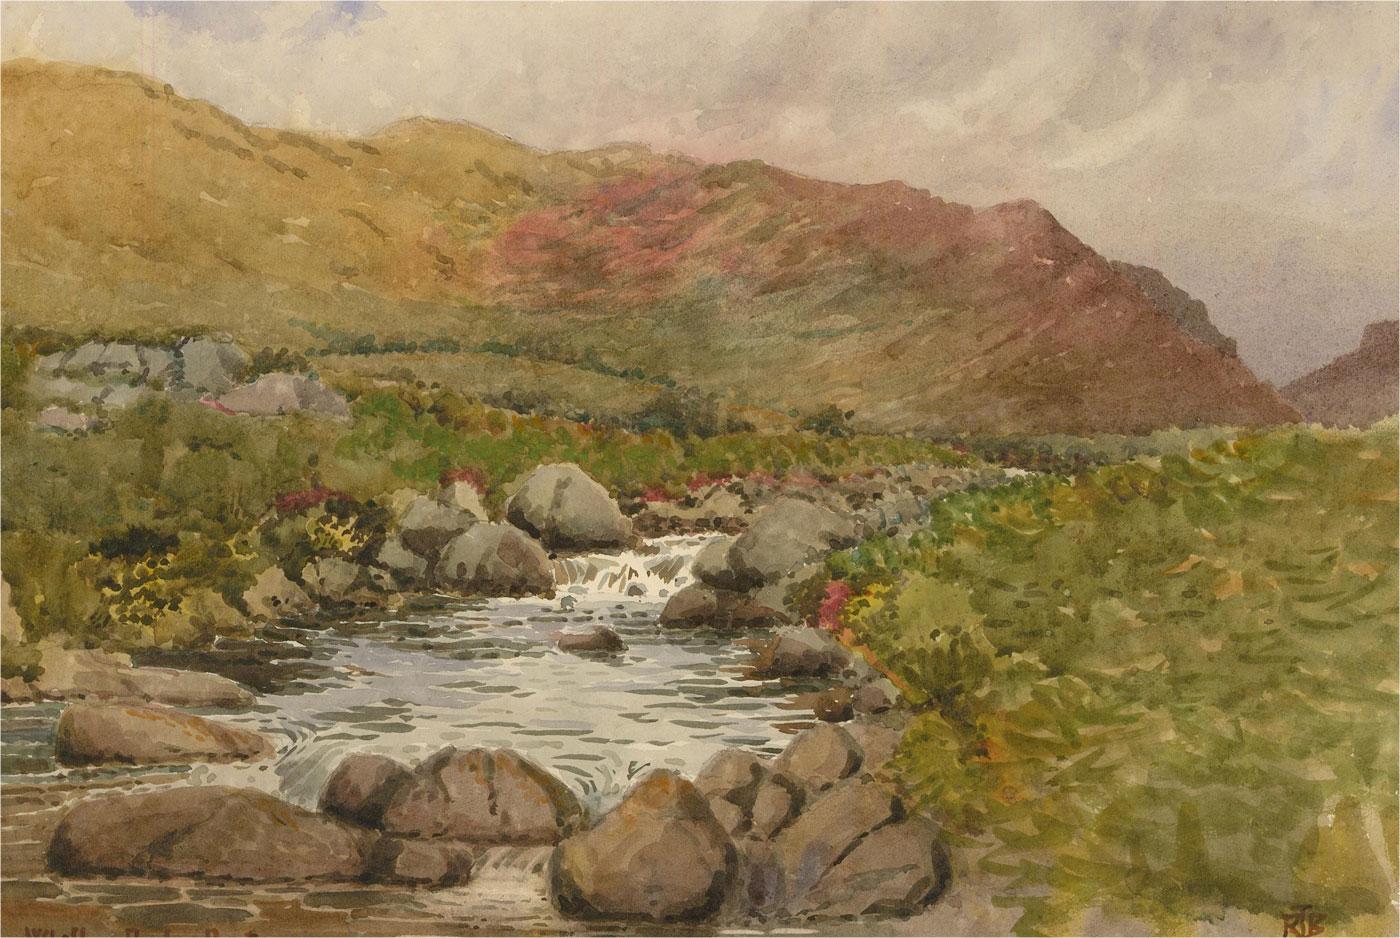 Raymond Turner Barker (1872-1945) - Early 20th Century Watercolour, Whillan Beck